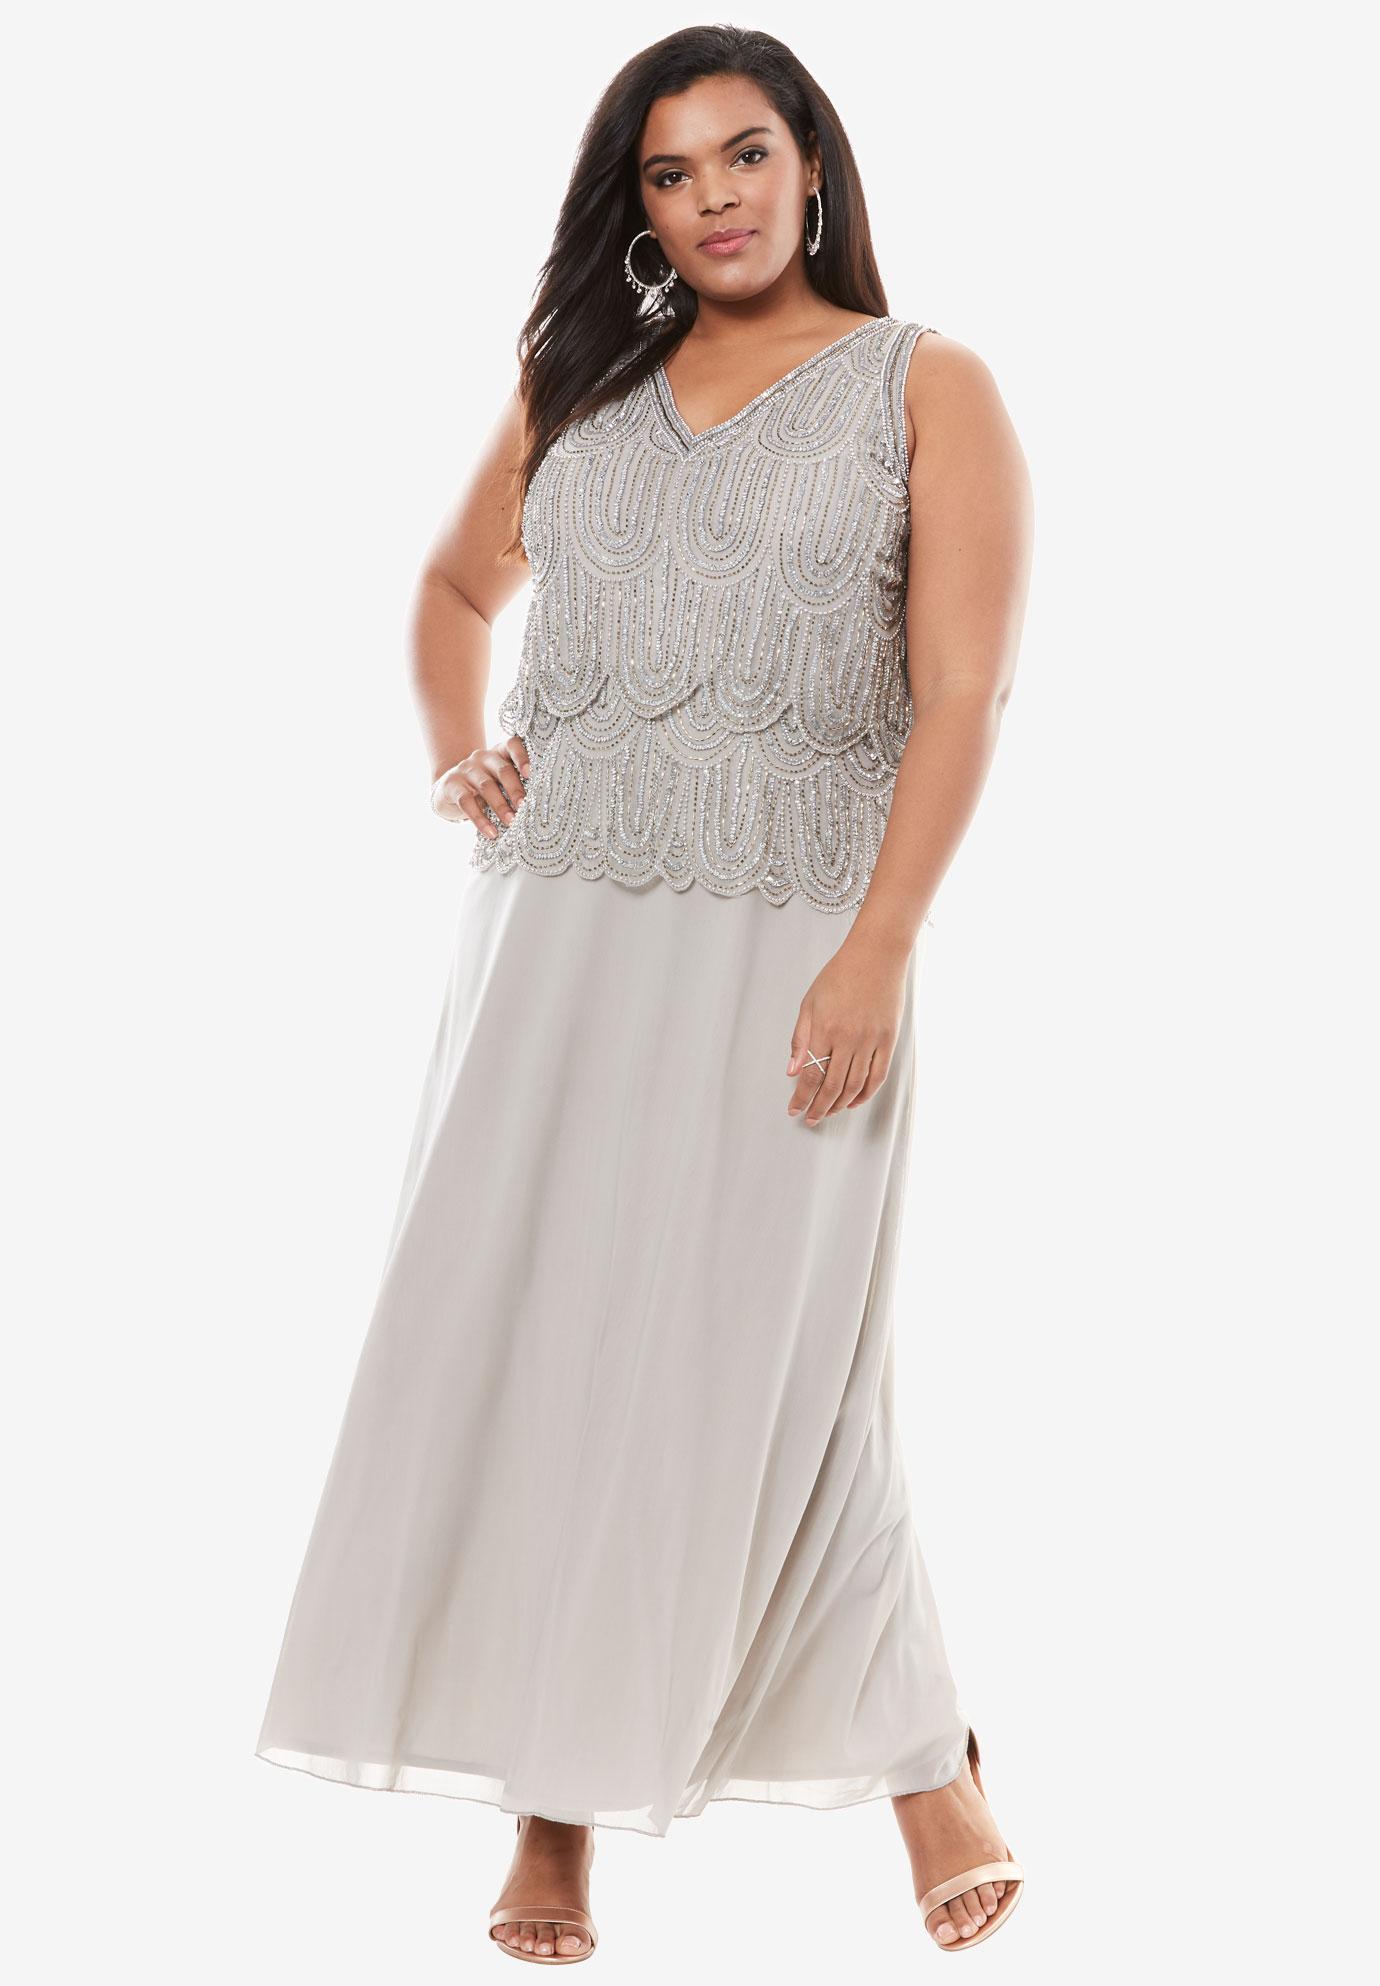 Scallop Beaded Dress by Pisarro Nights | Plus Size Evening Dresses ...